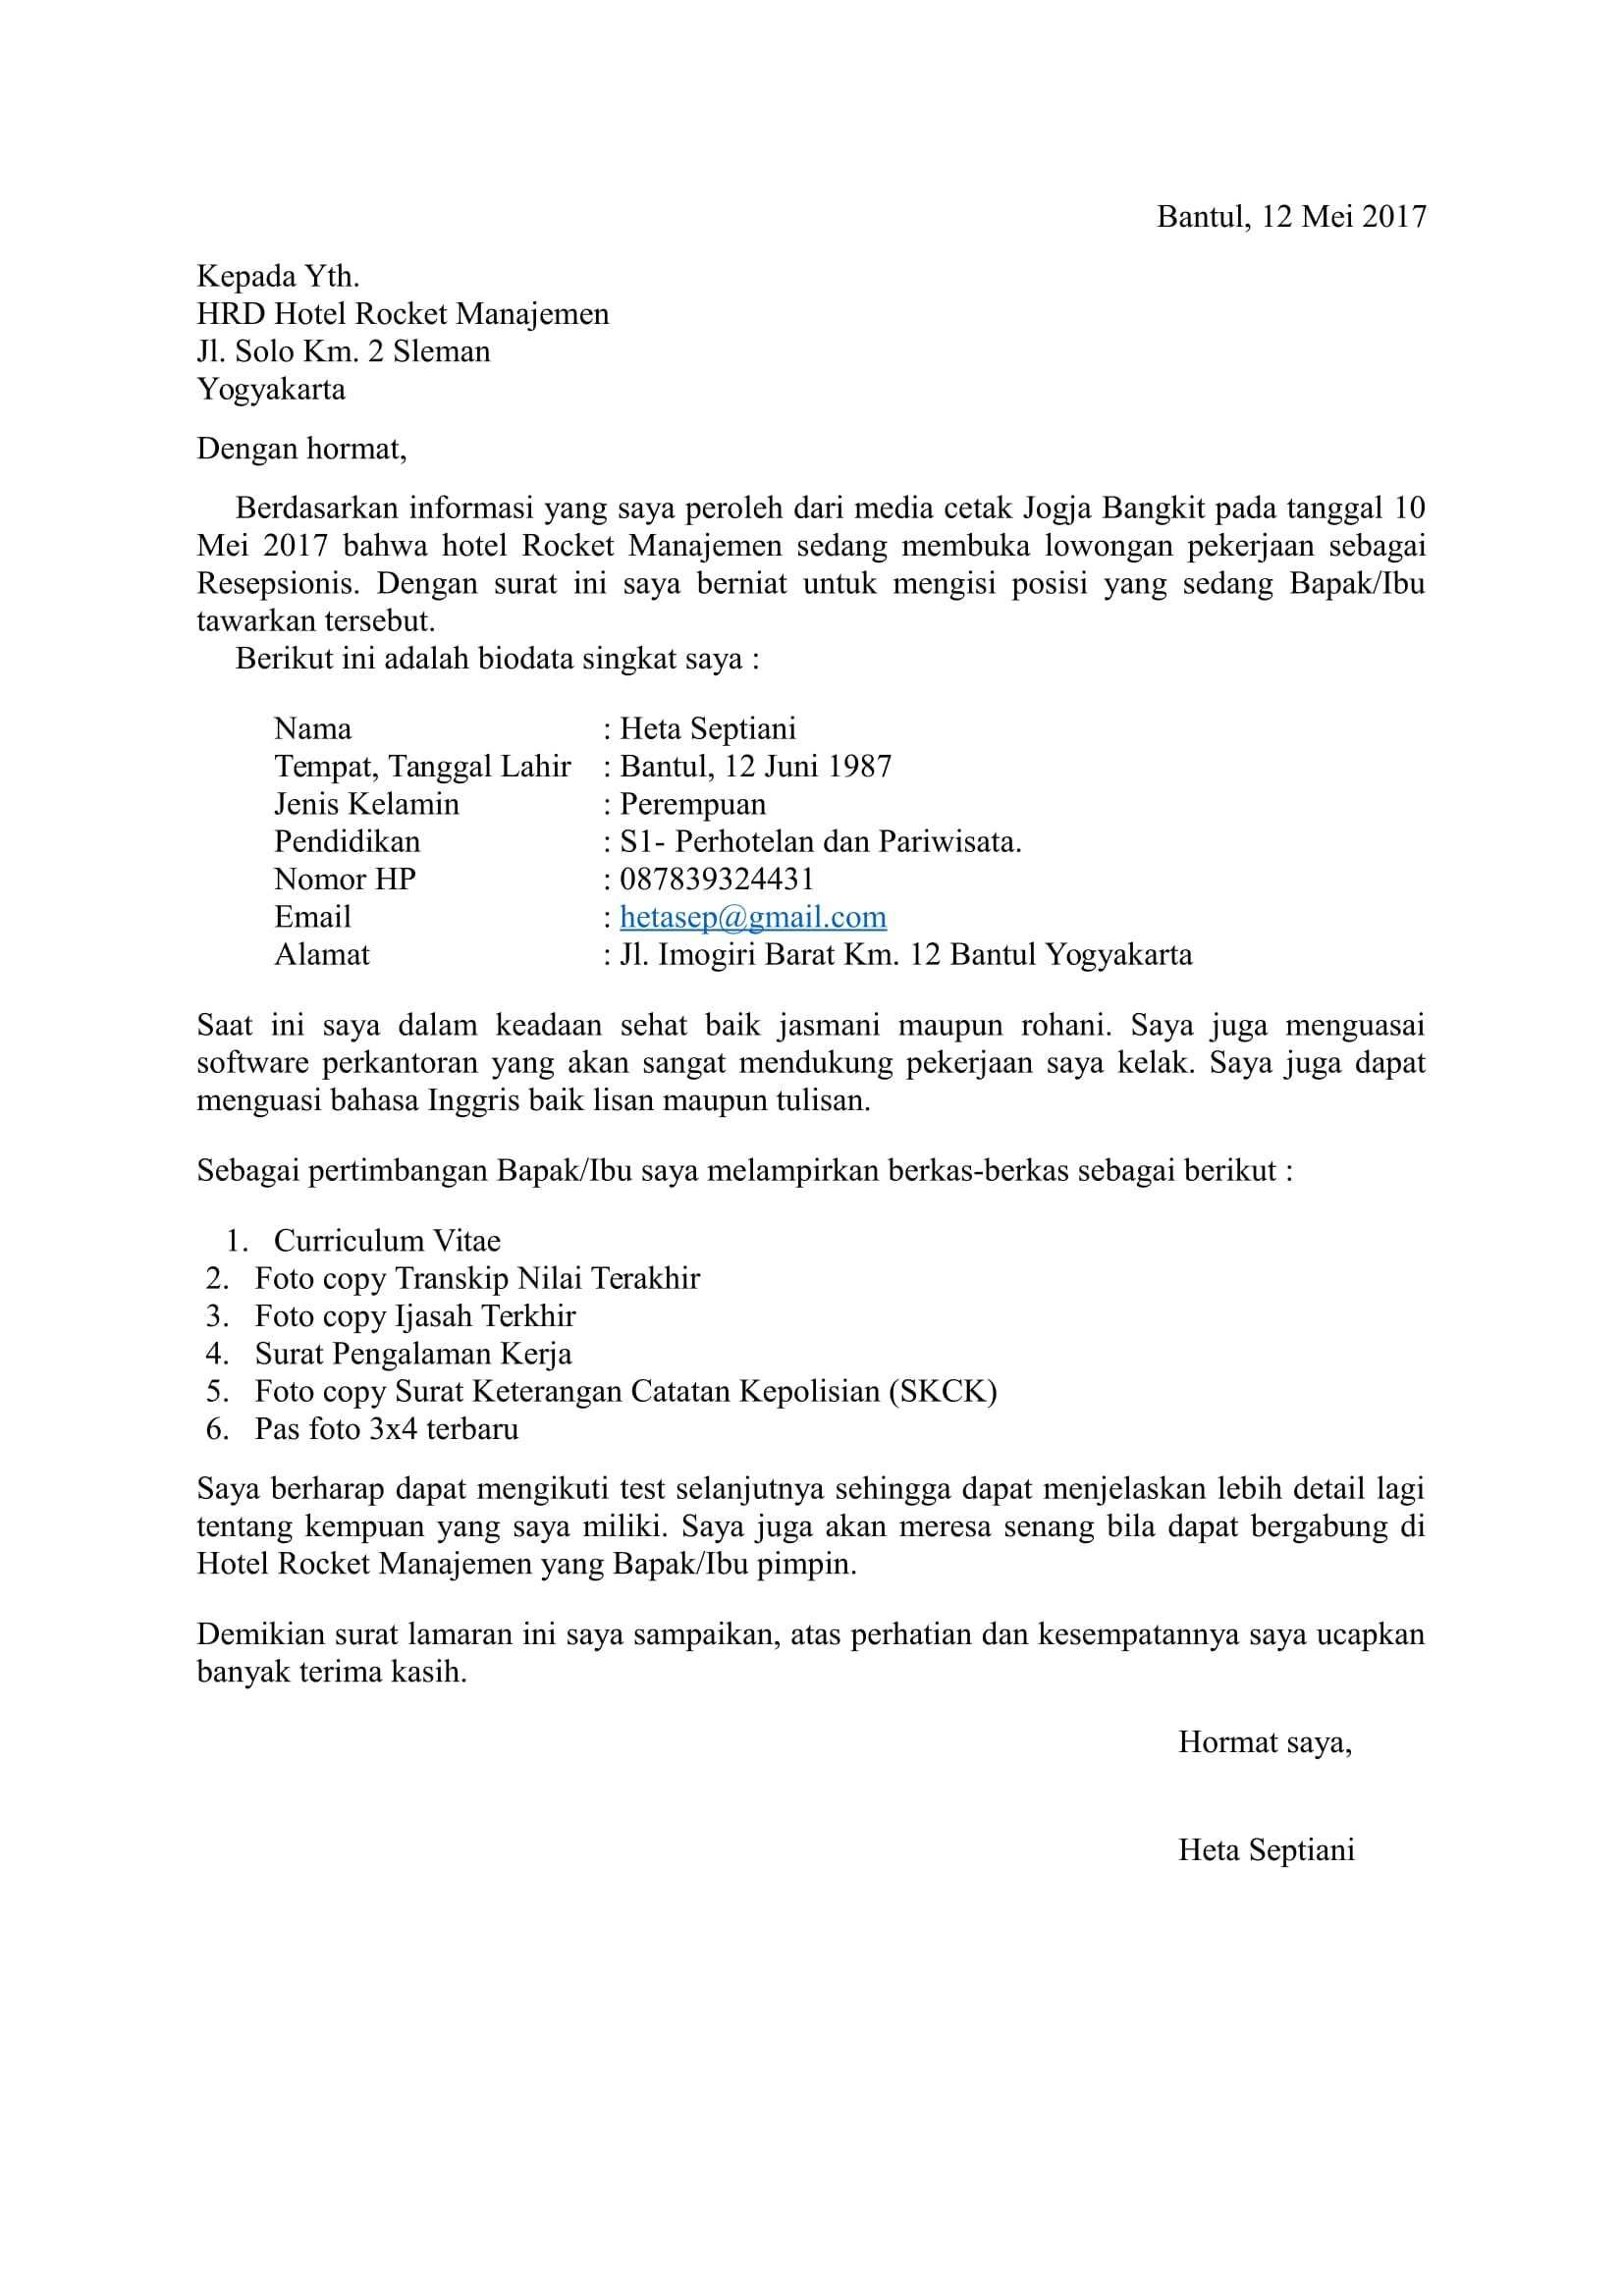 50 Contoh Surat Lamaran Kerja Tulis Tangan Menurut Bahasa Indonesia Surat Tulisan Bahasa